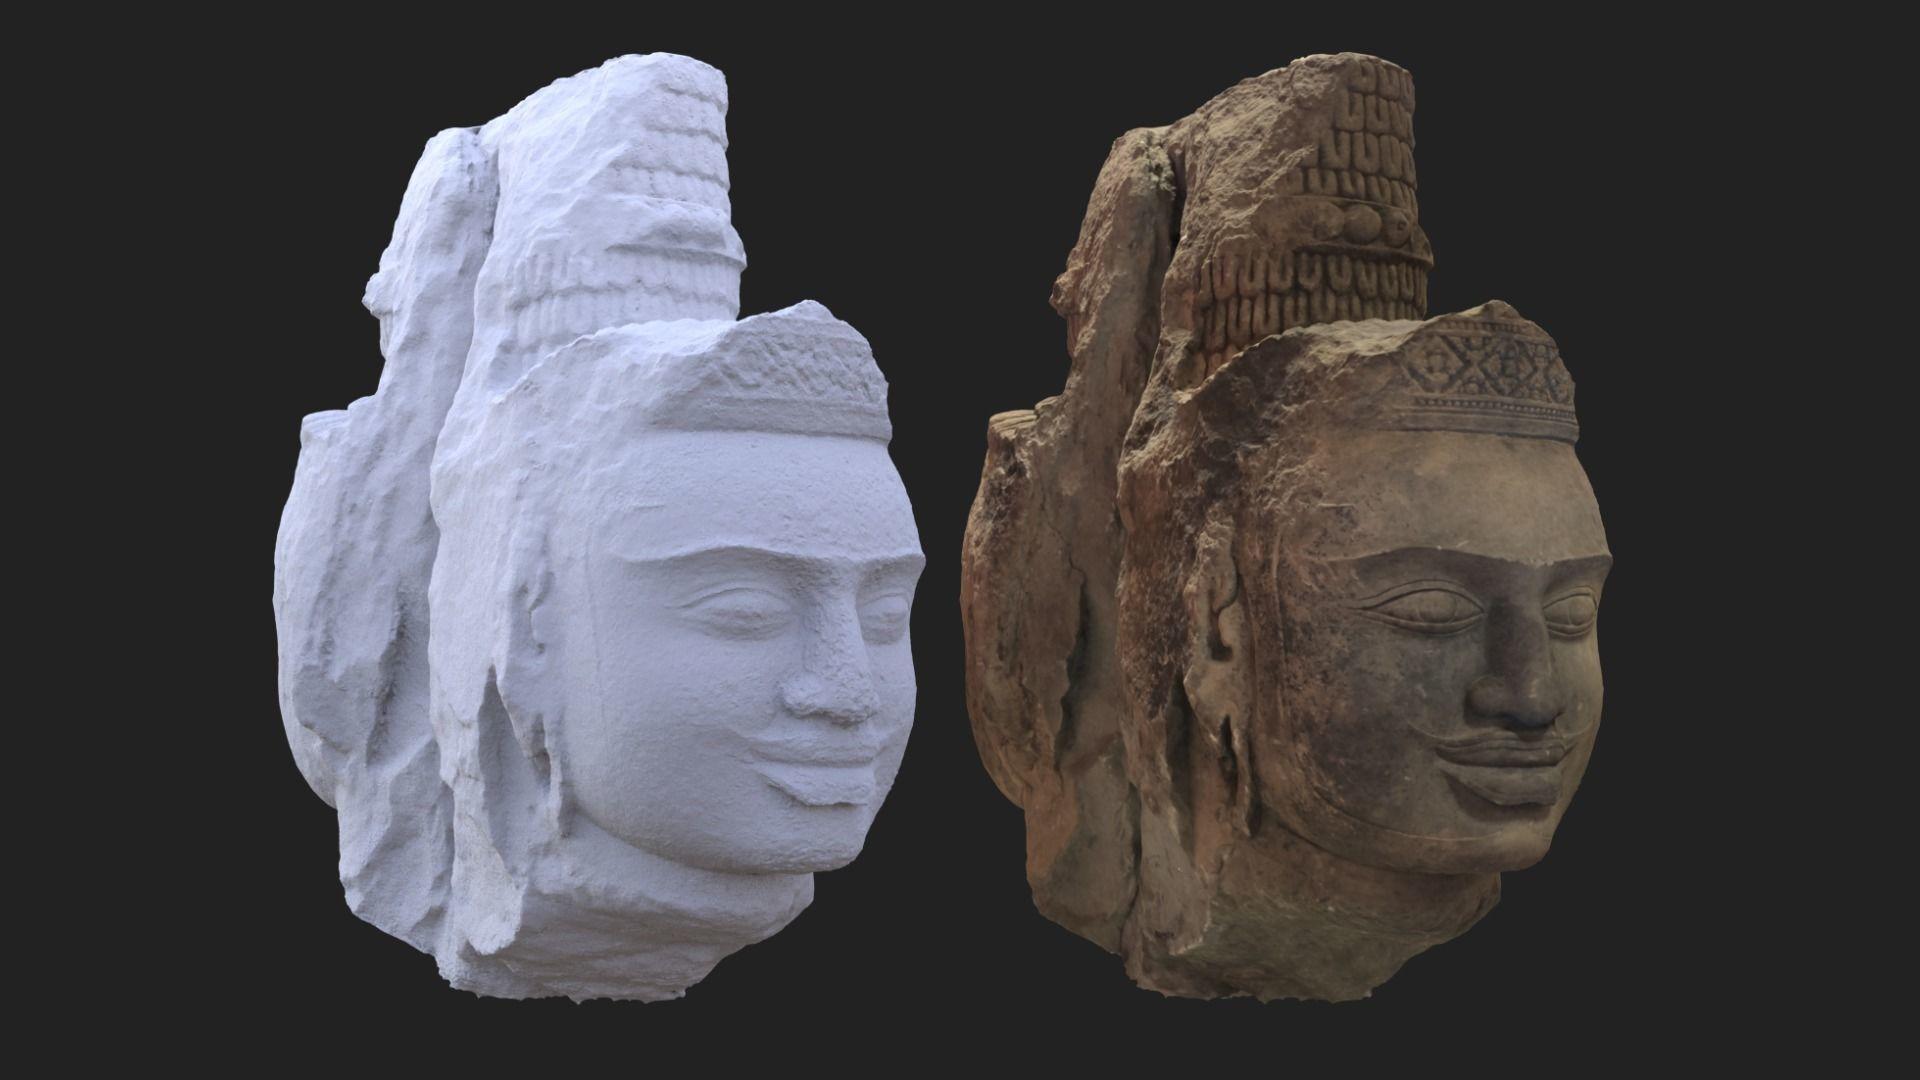 Brahma heads Cambodia Angkorian artifacts 3D Scan